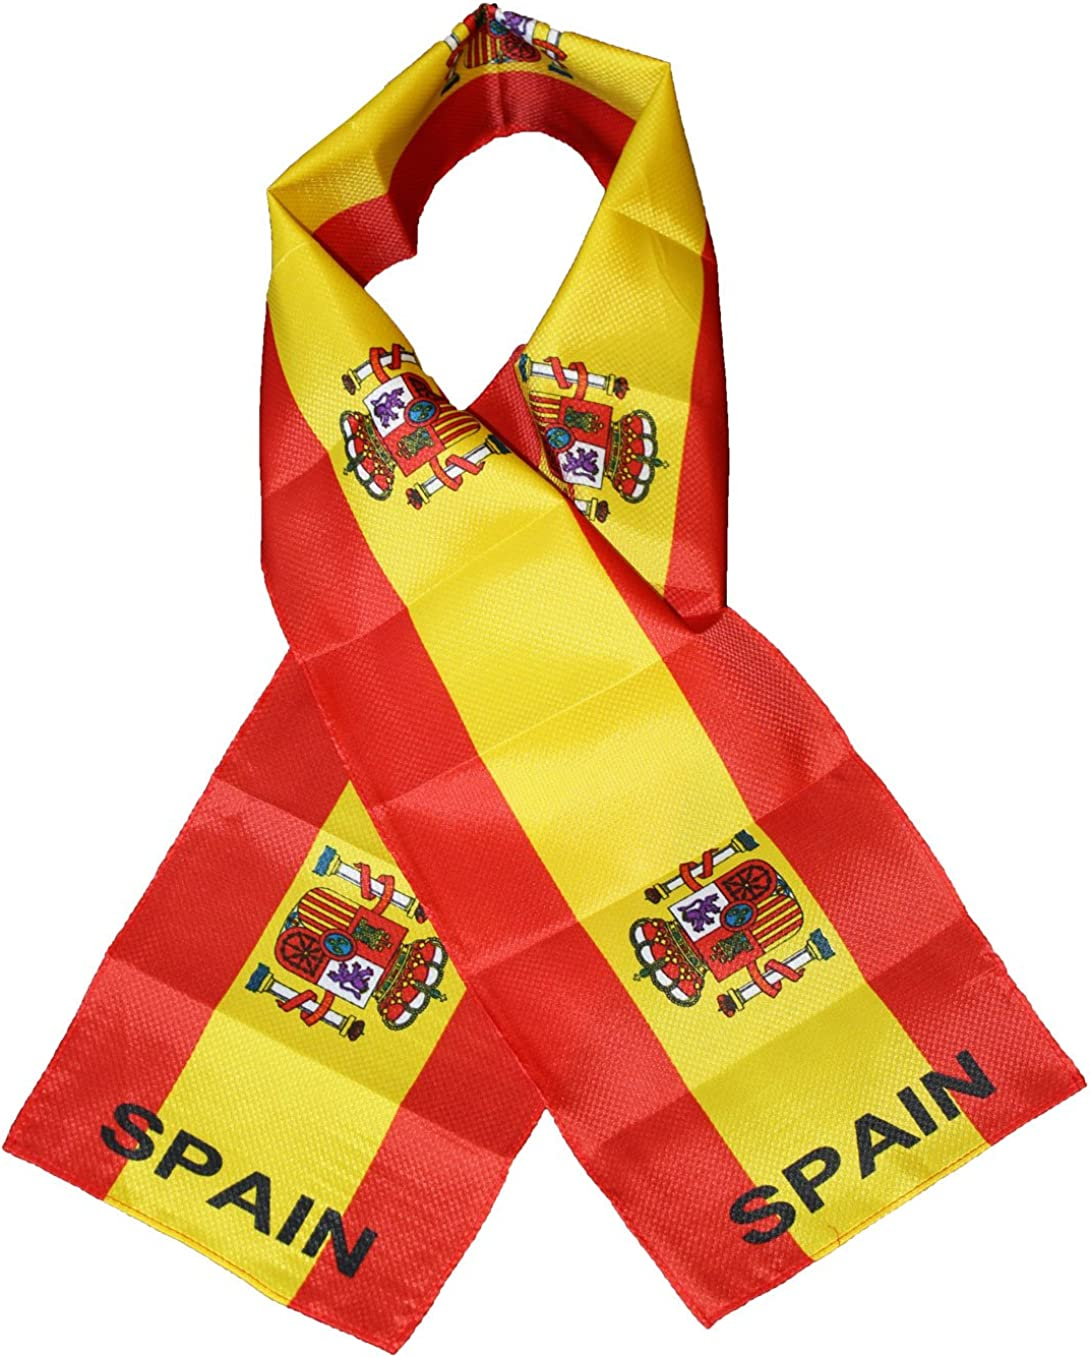 Spain Lightweight Flag Scarf